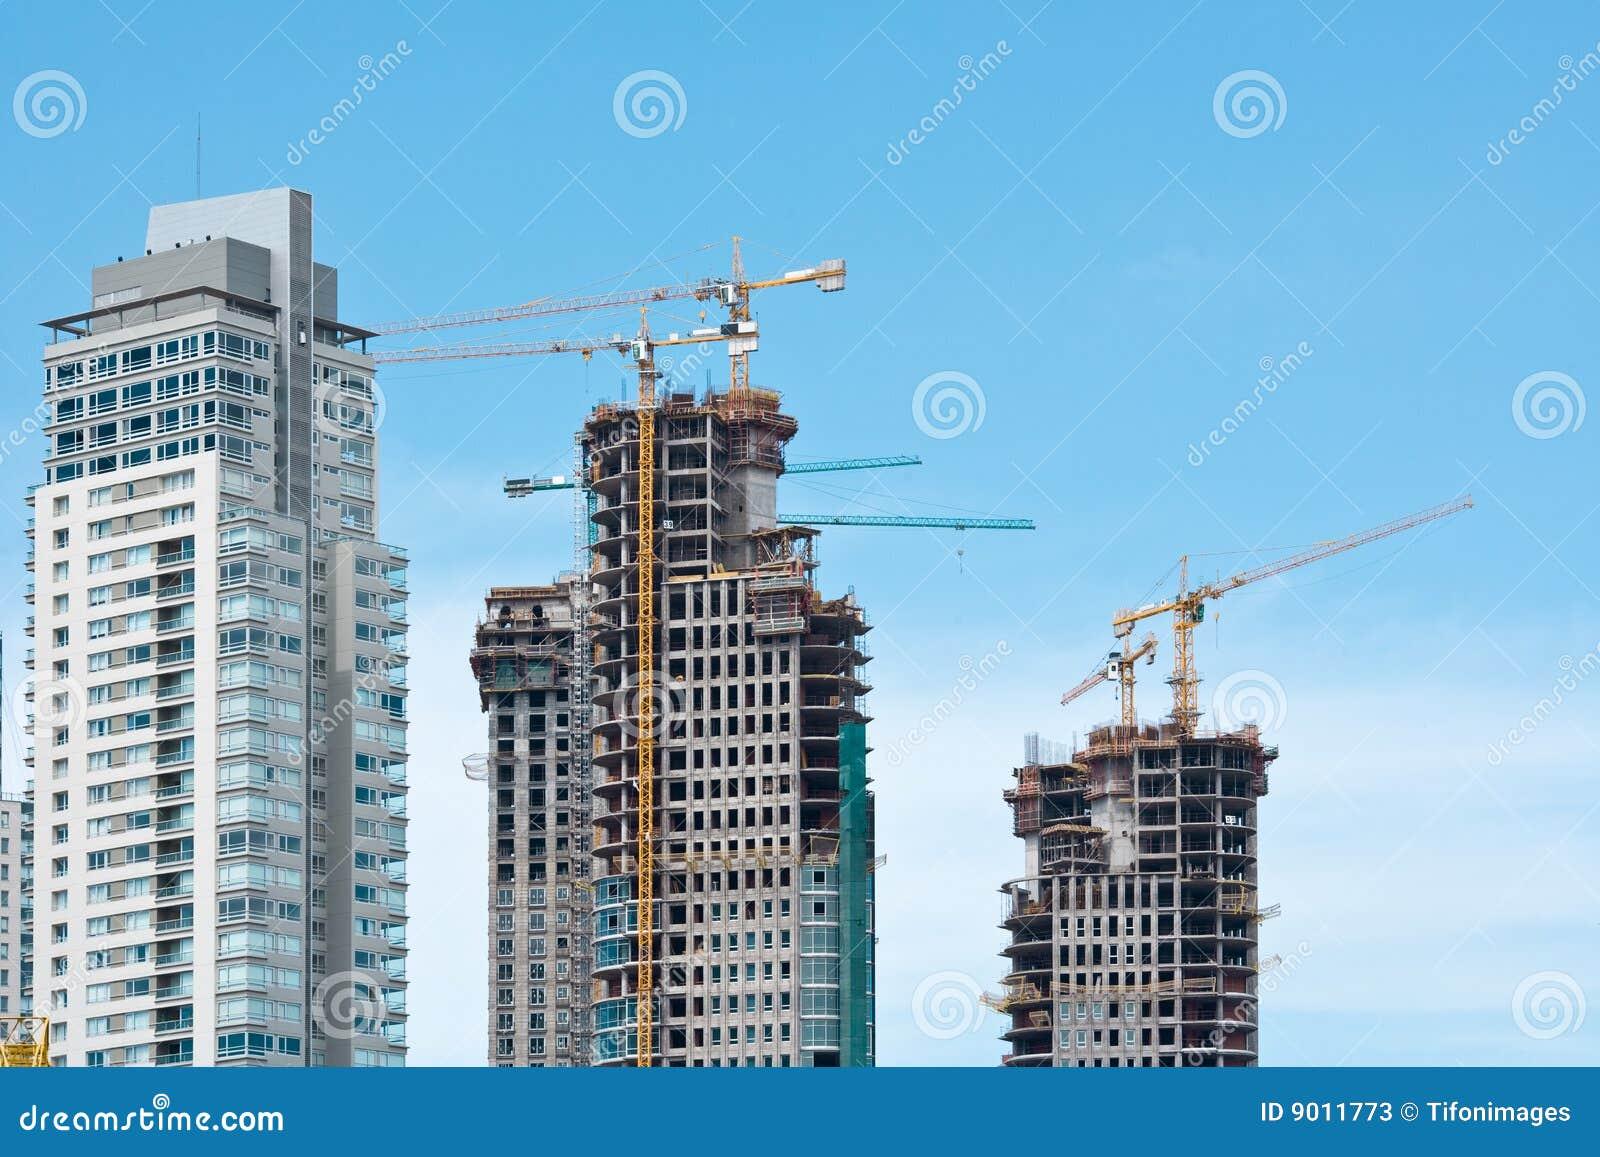 Real Estate Development : Real estate development stock photos image